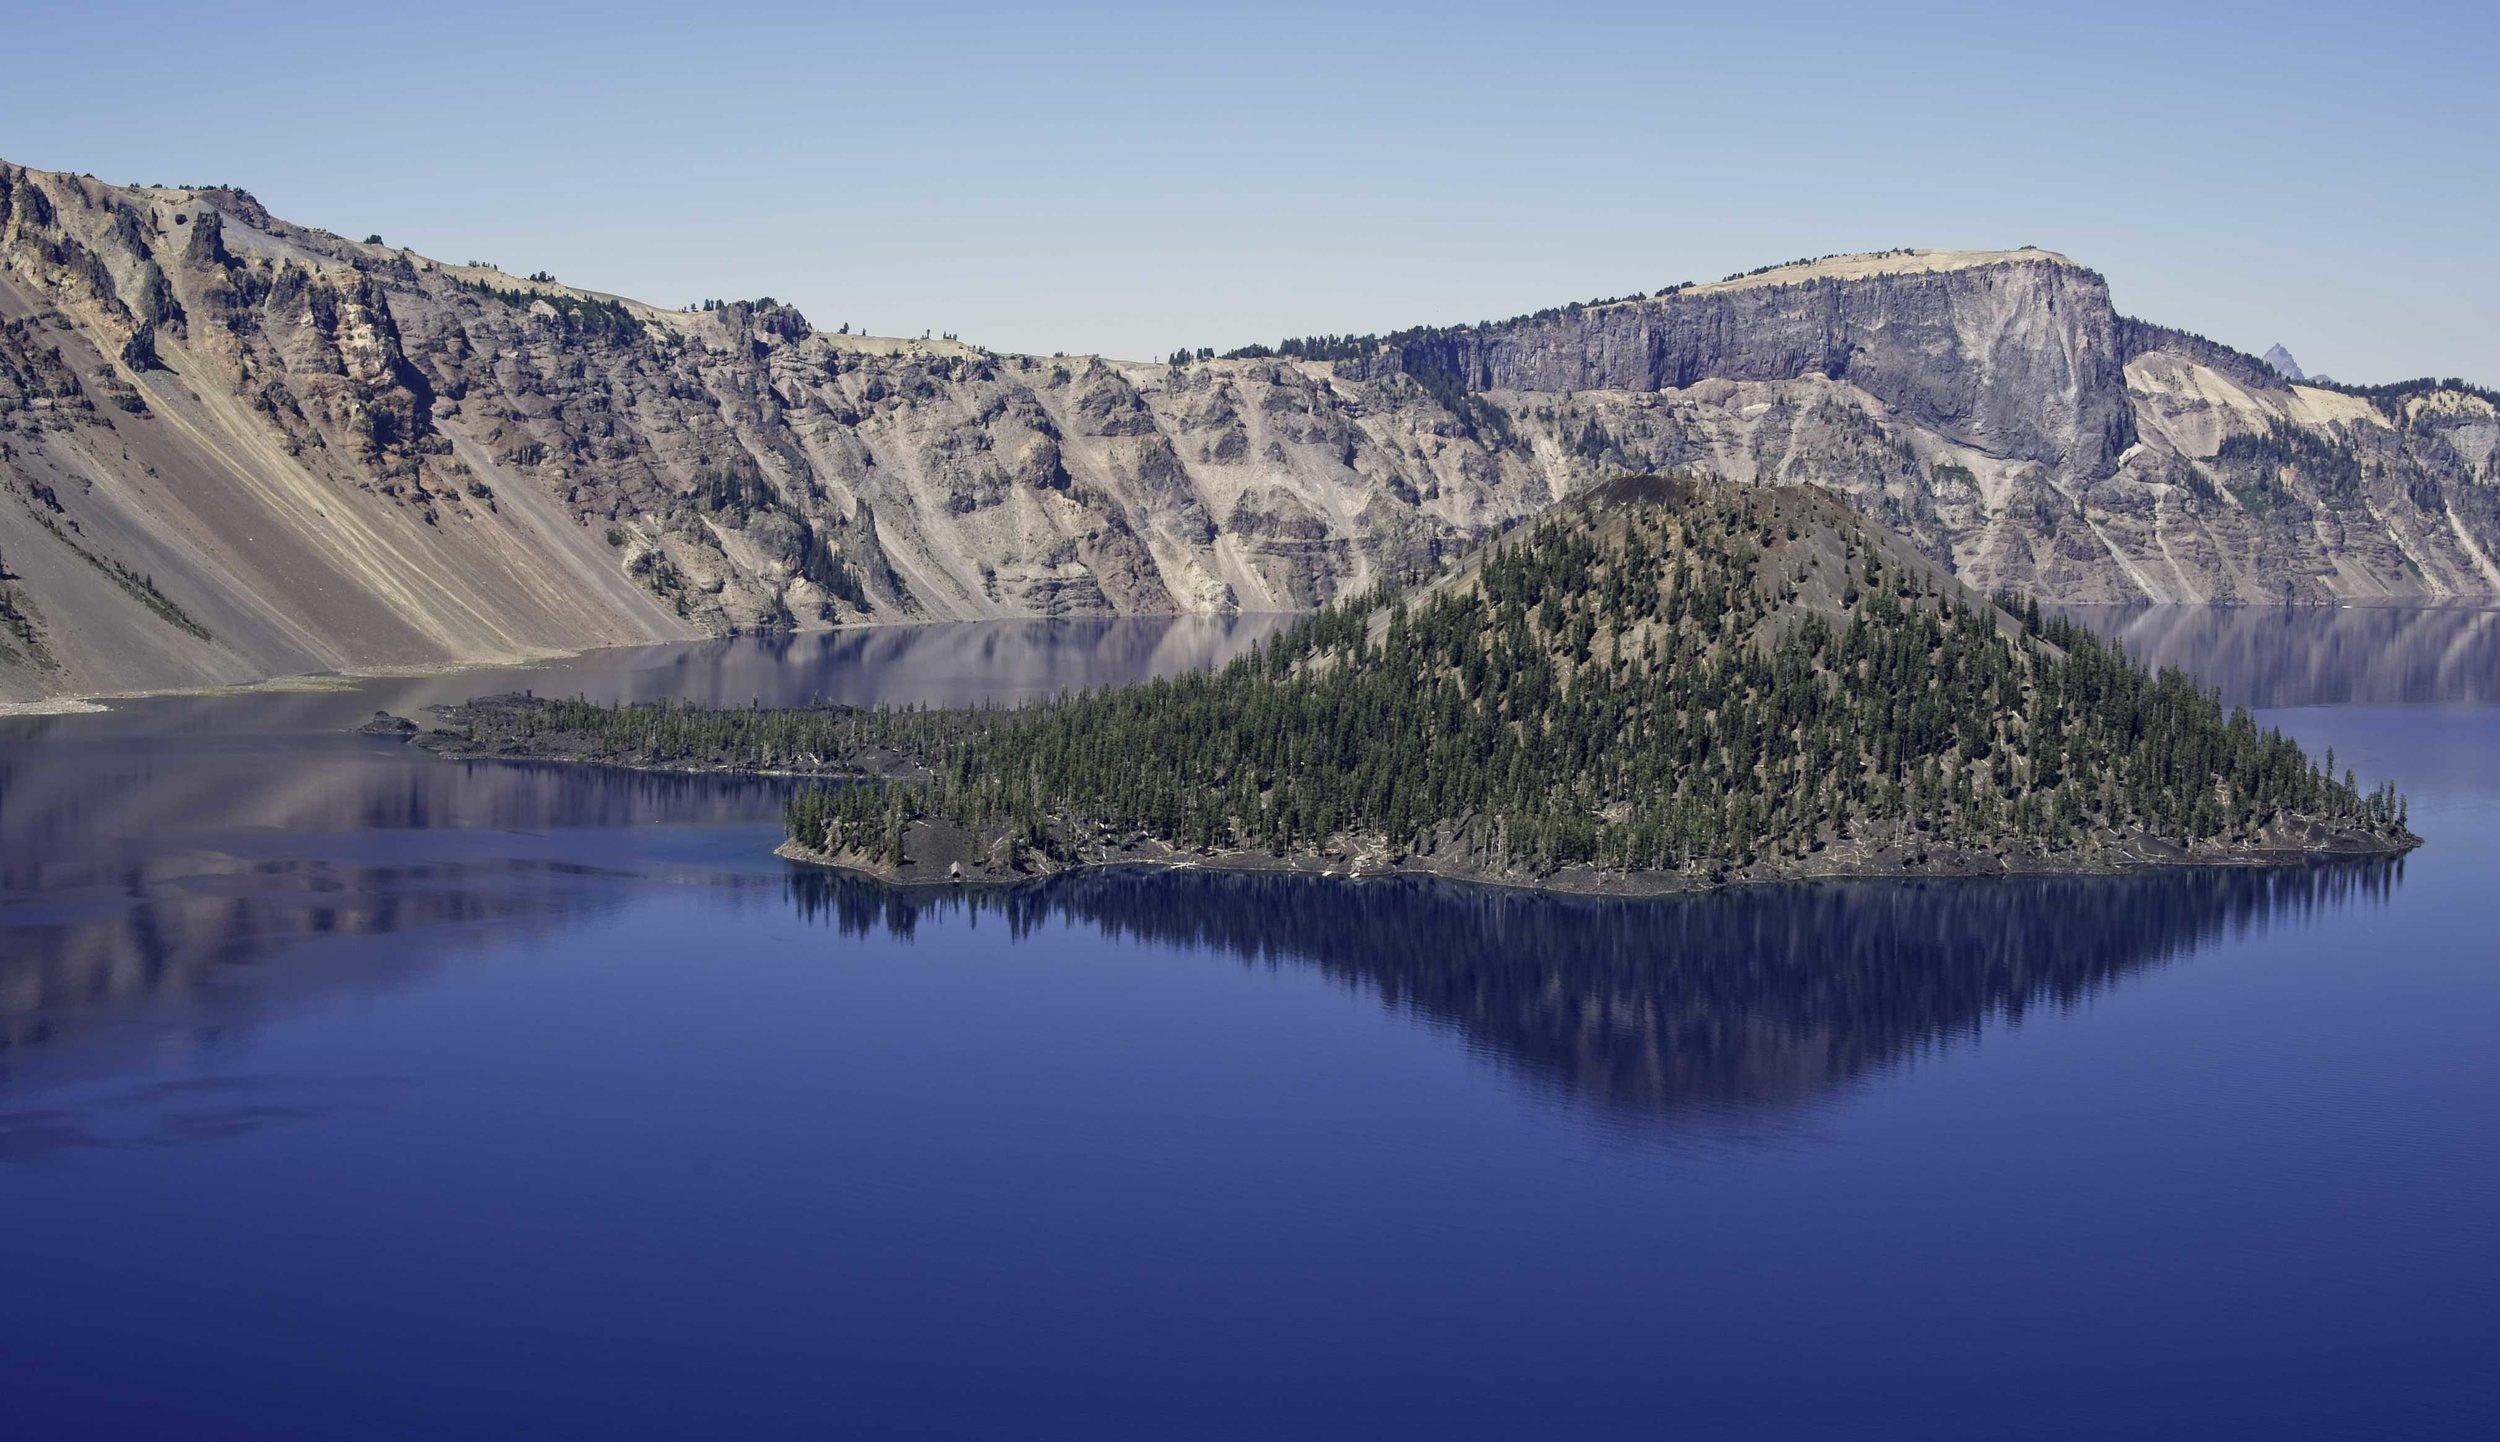 Crater Lake - Crater Lake National Park, Oregon